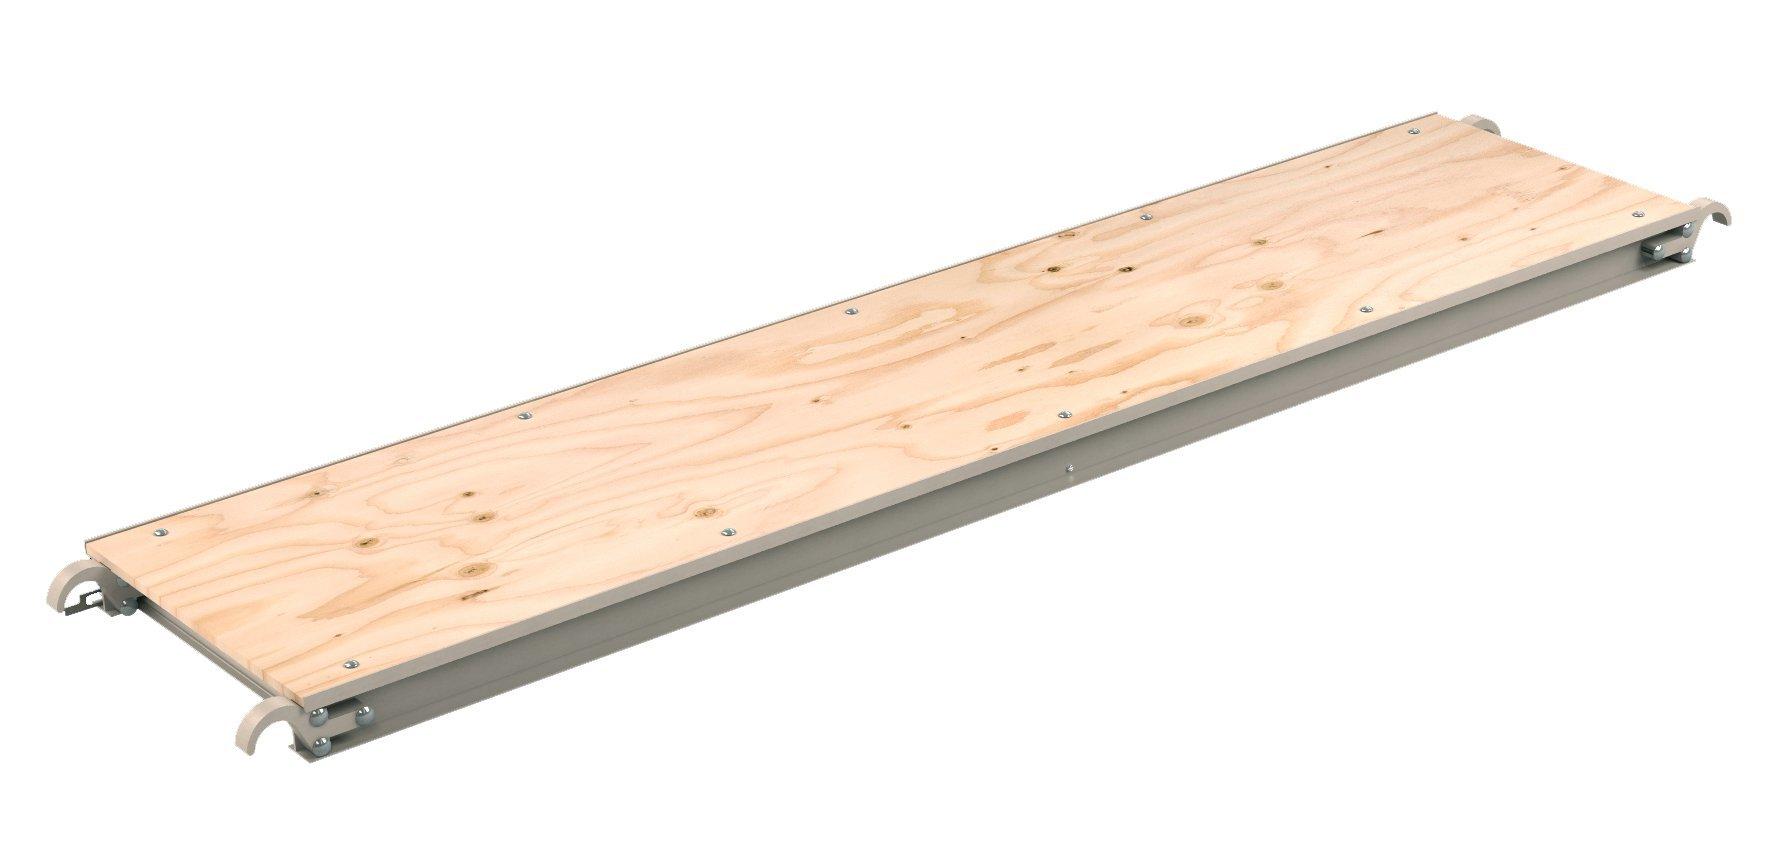 Bon 14-286 7-Feet Aluminum Scaffold Plank